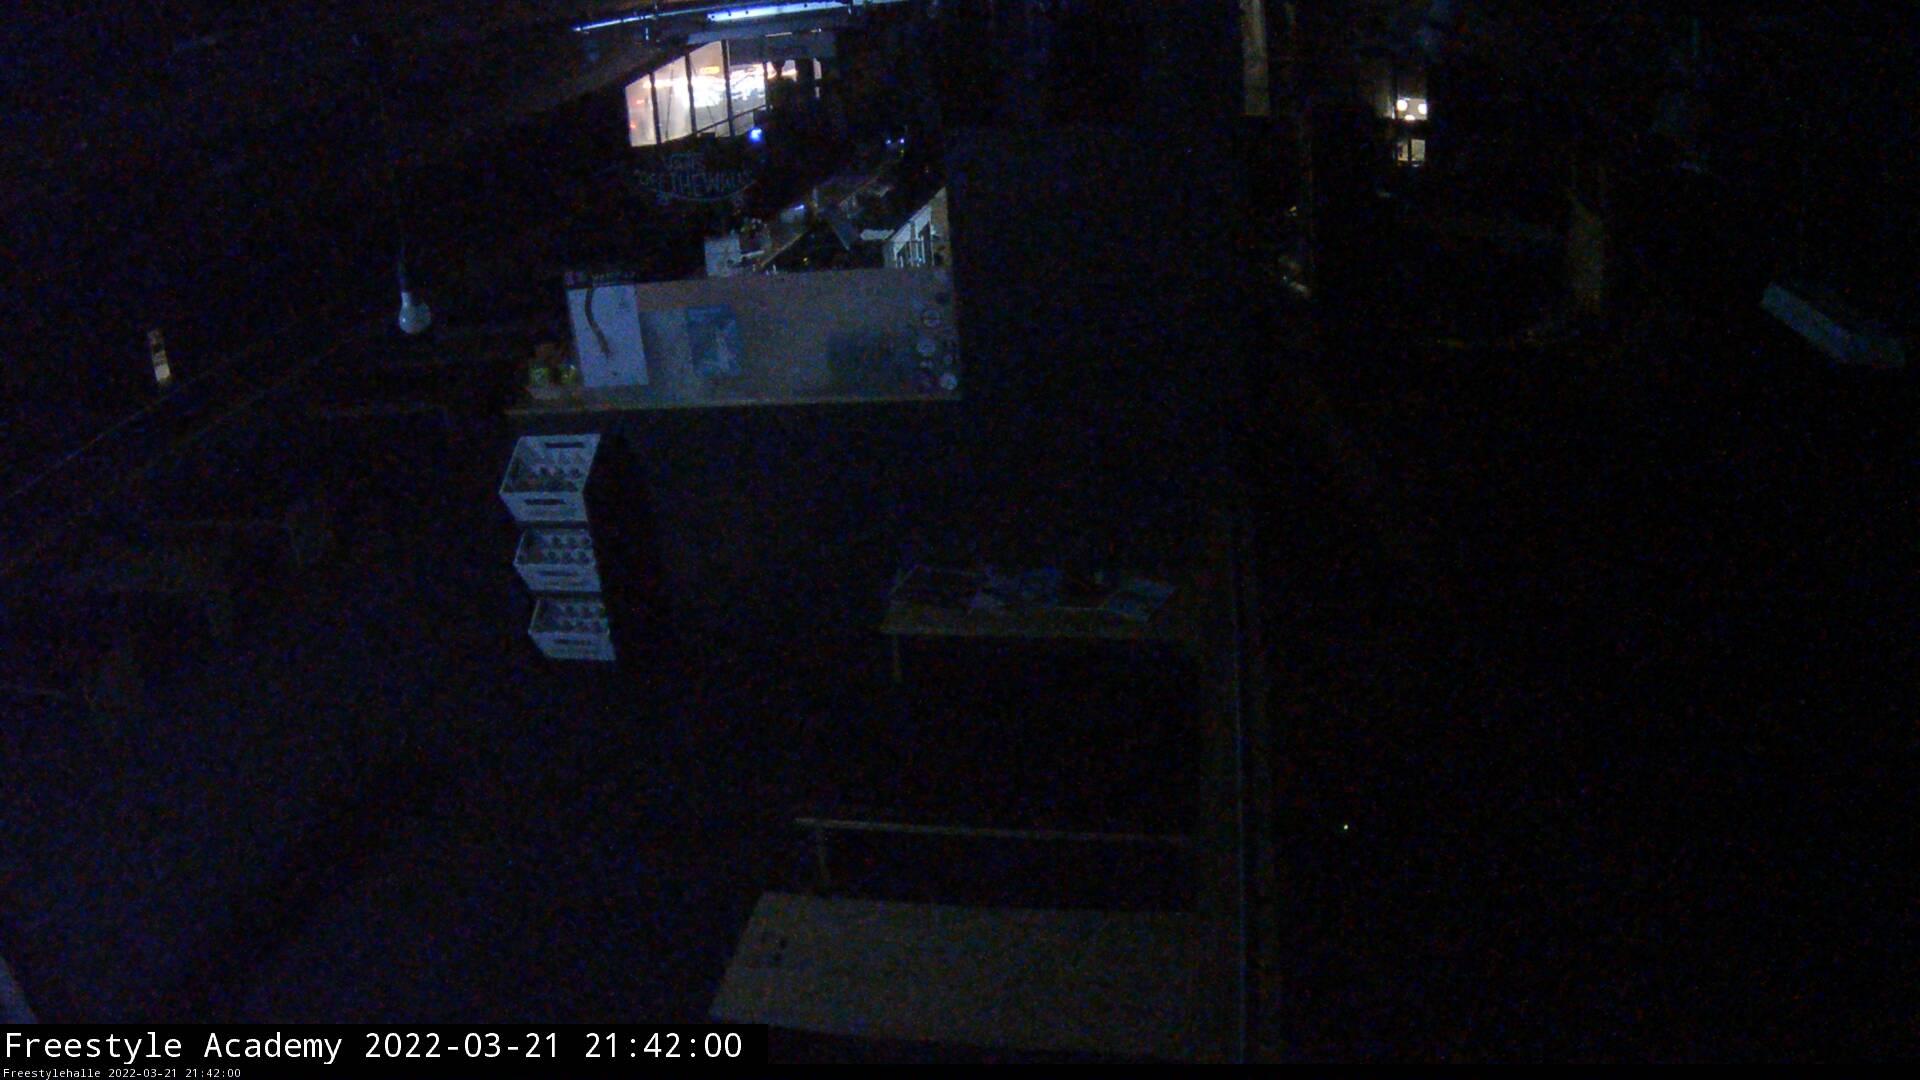 Webcam image